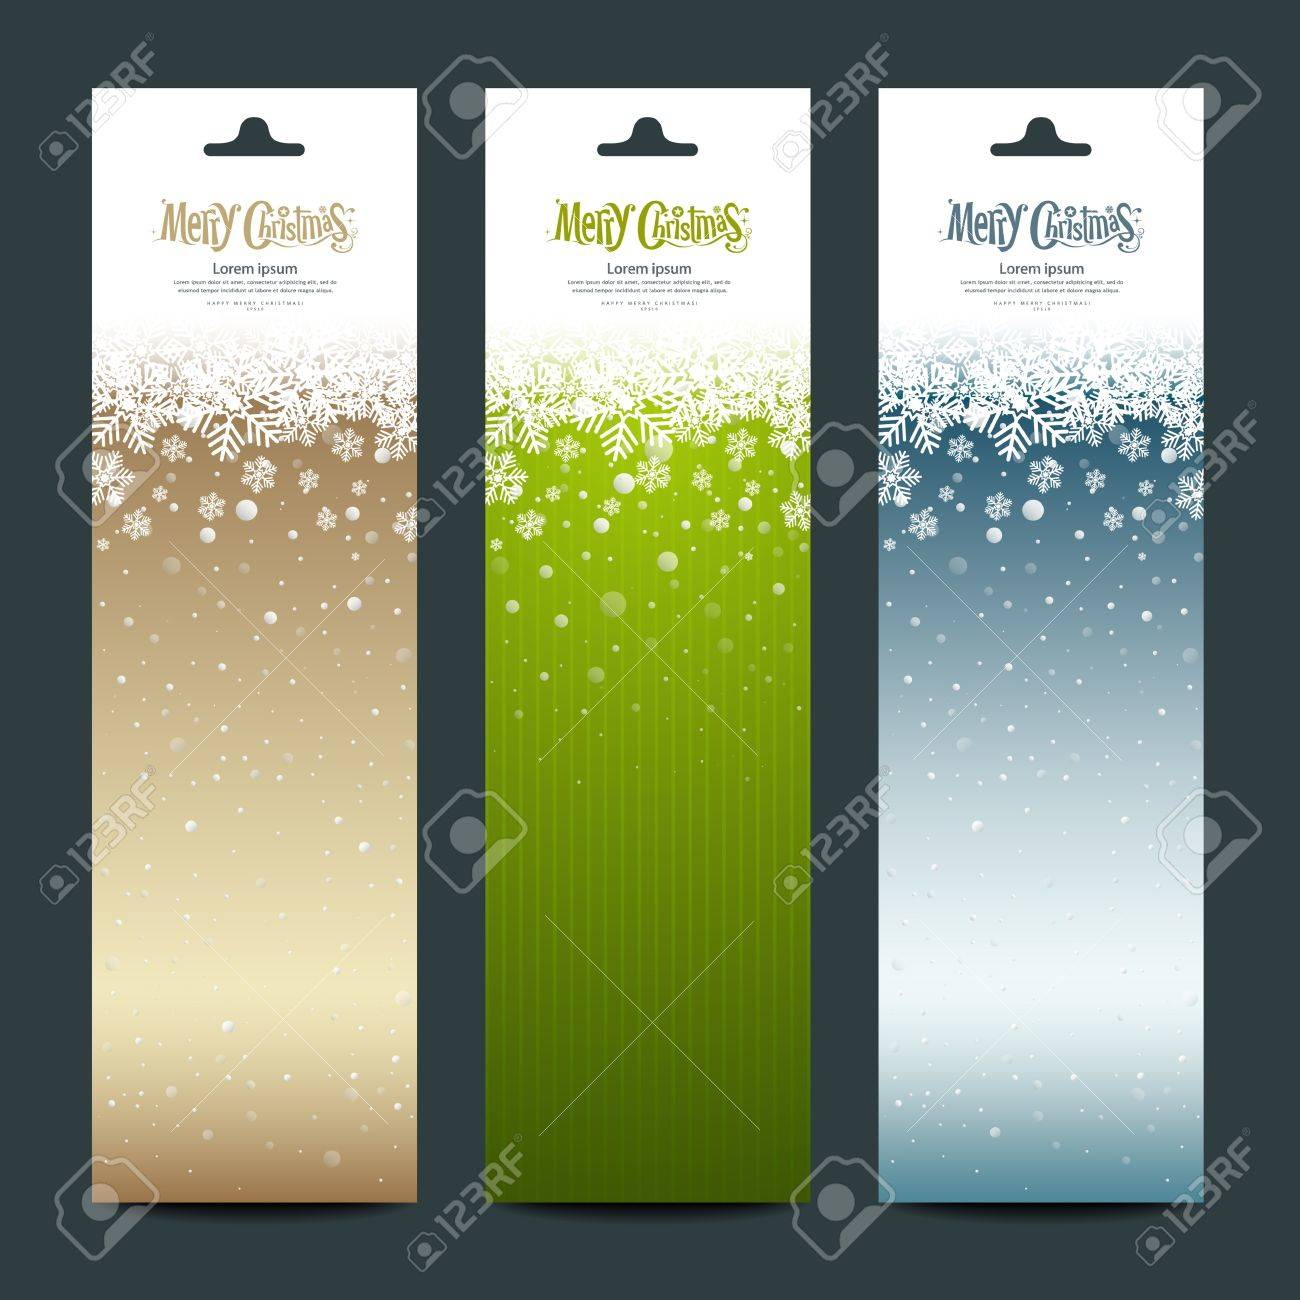 Merry Christmas banner vertical background, vector Stock Vector - 16164109